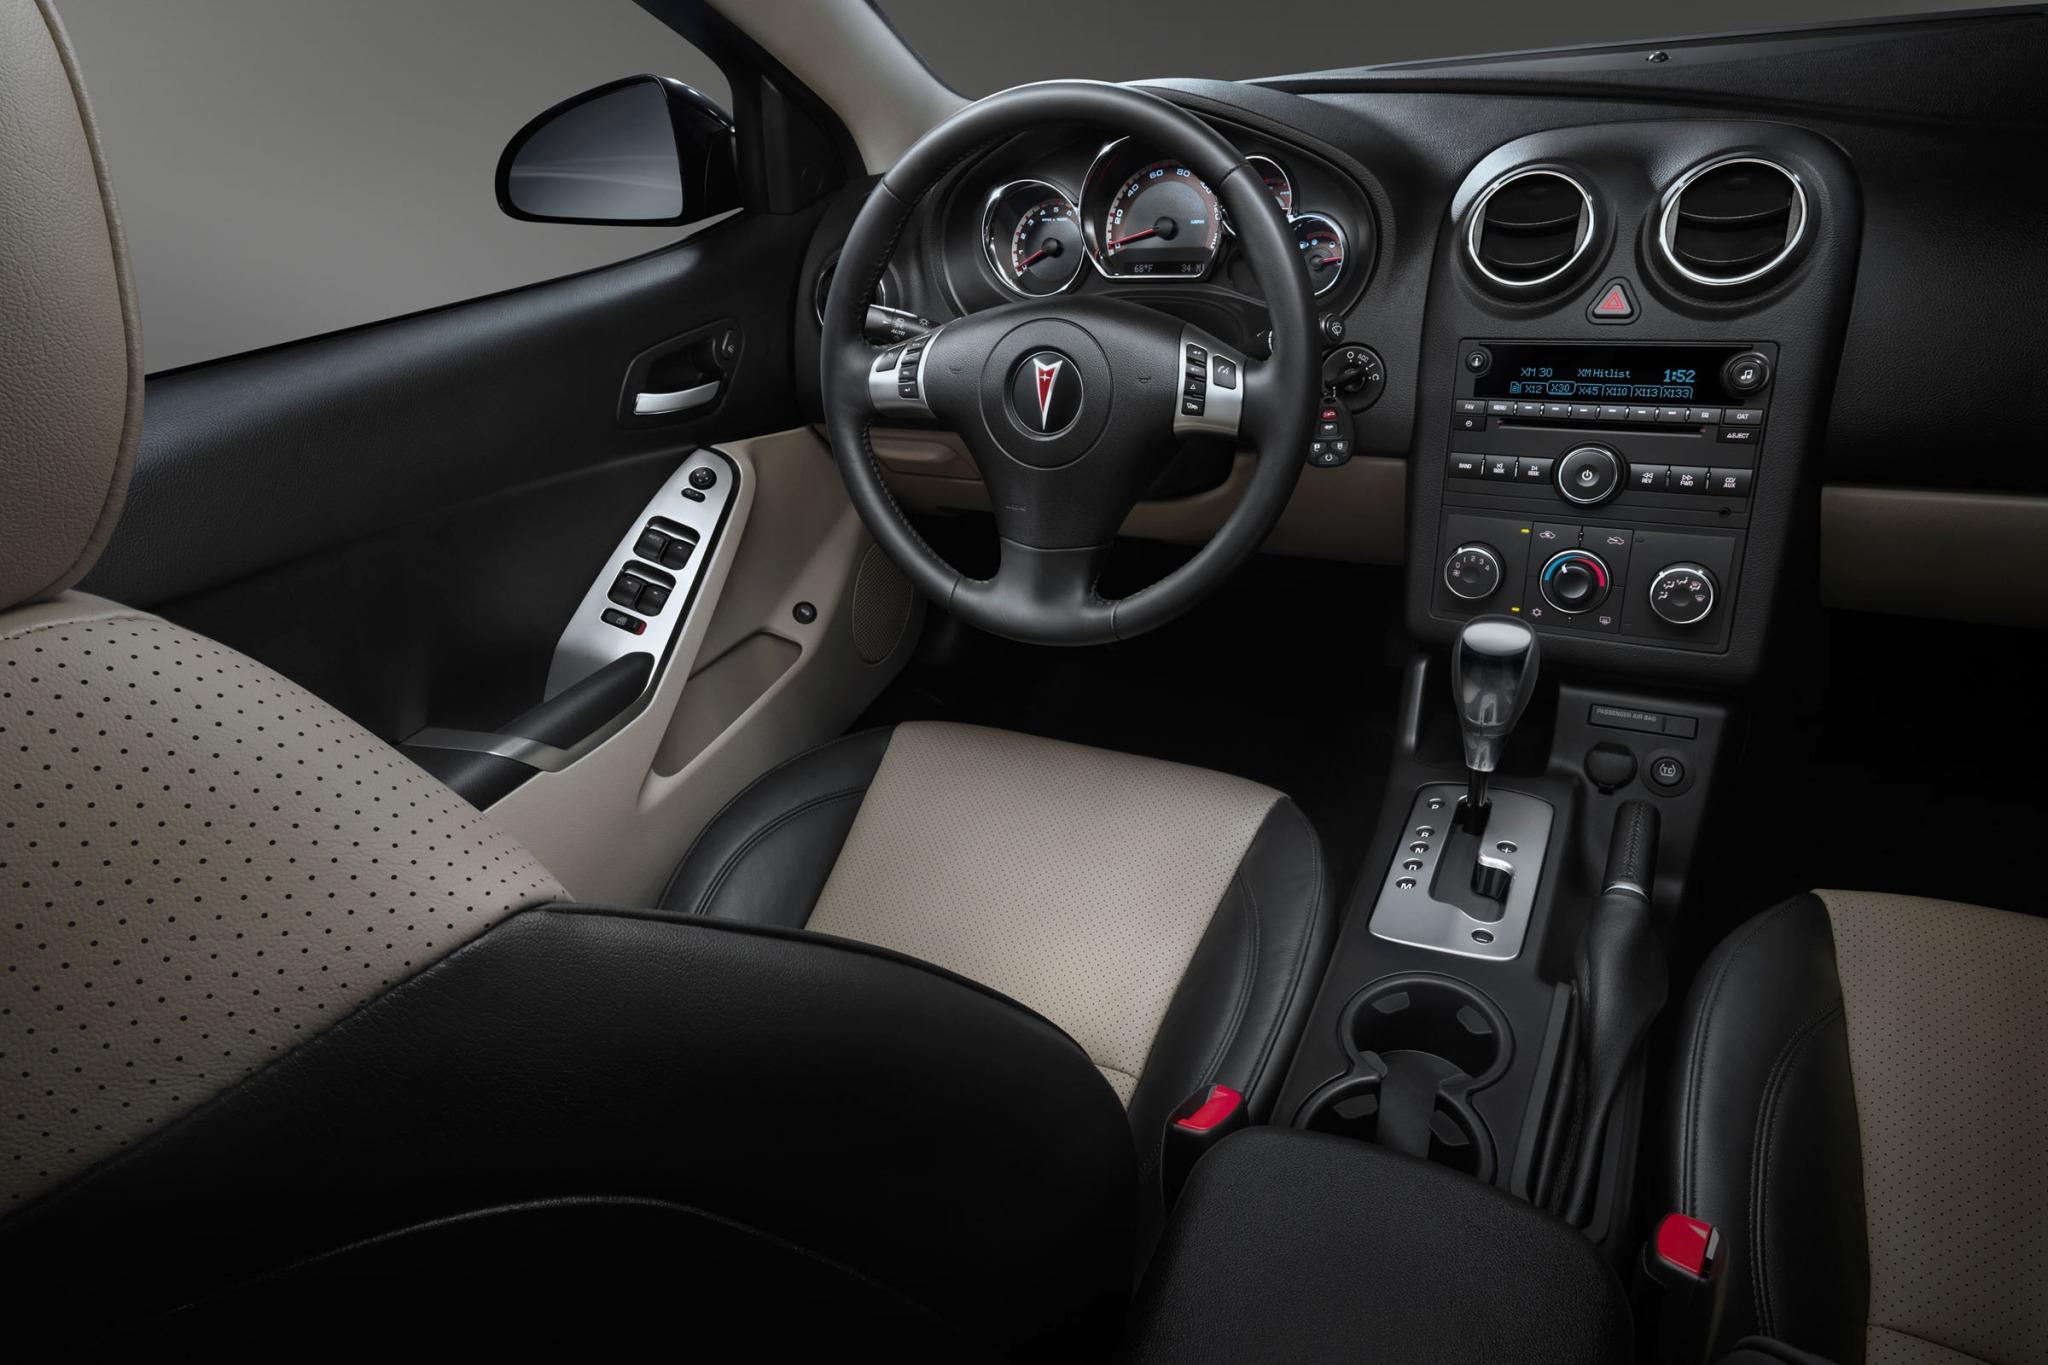 2010 pontiac g6 sedan ext exterior 5